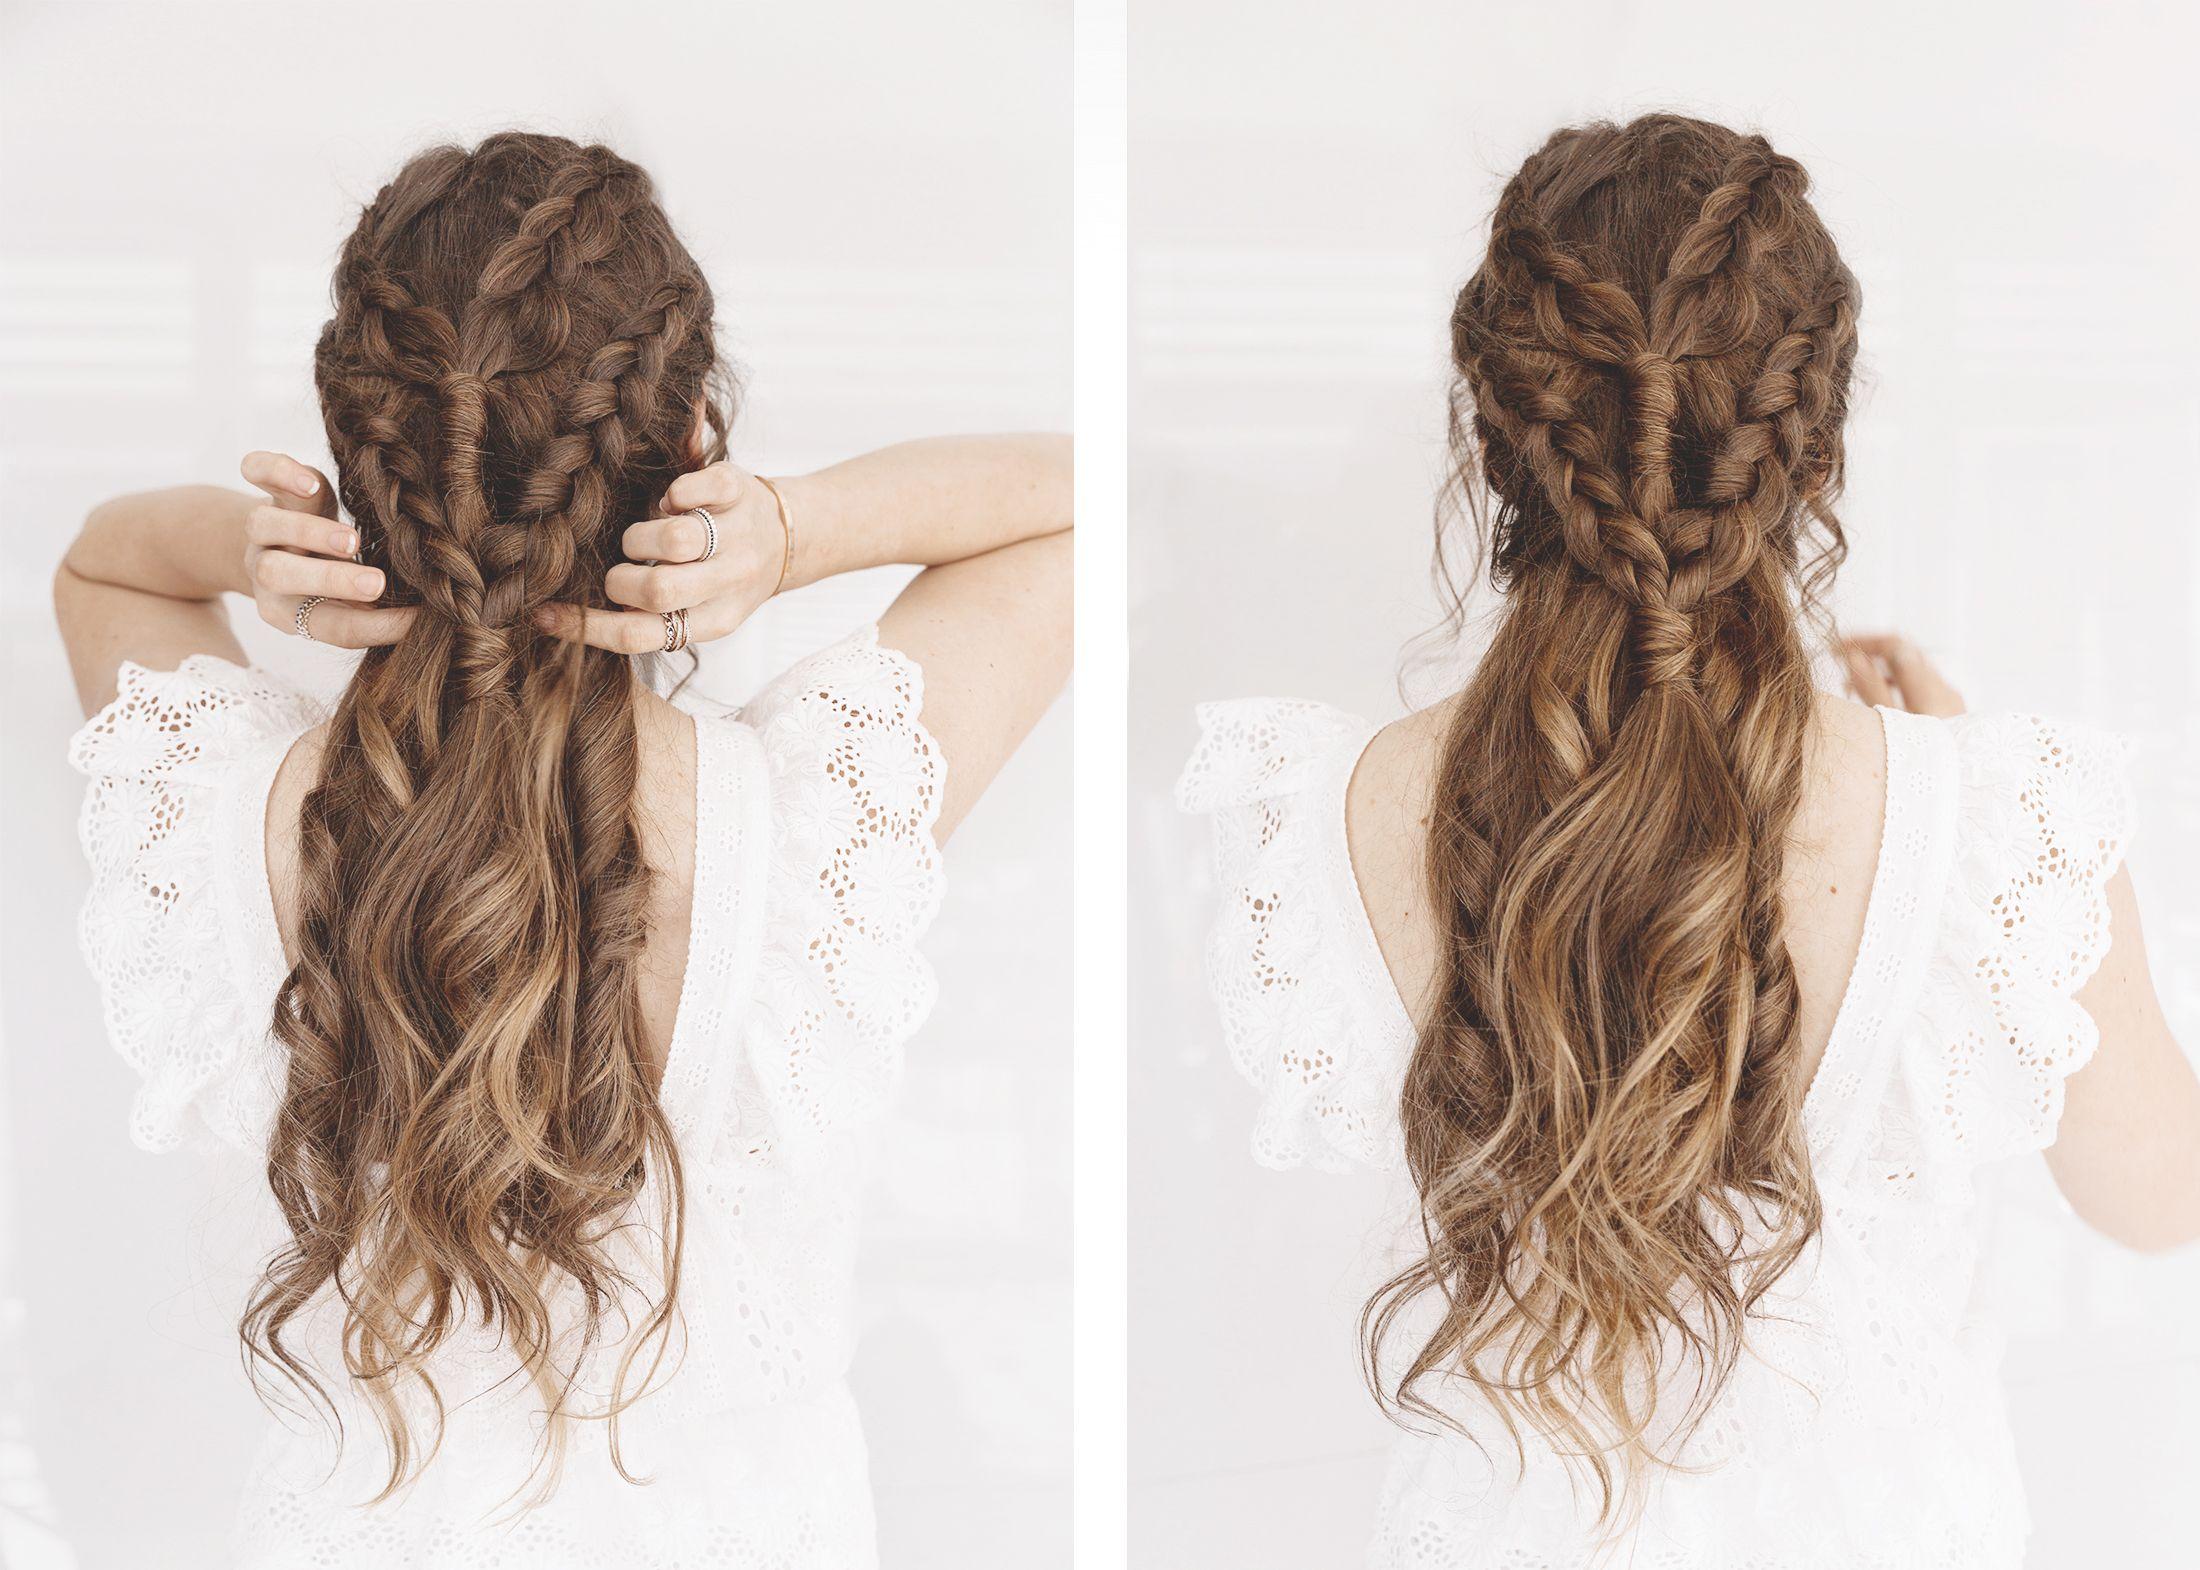 Khaleesi Hairstyle Tutorial | Braid hairstyles, Hair style and Makeup